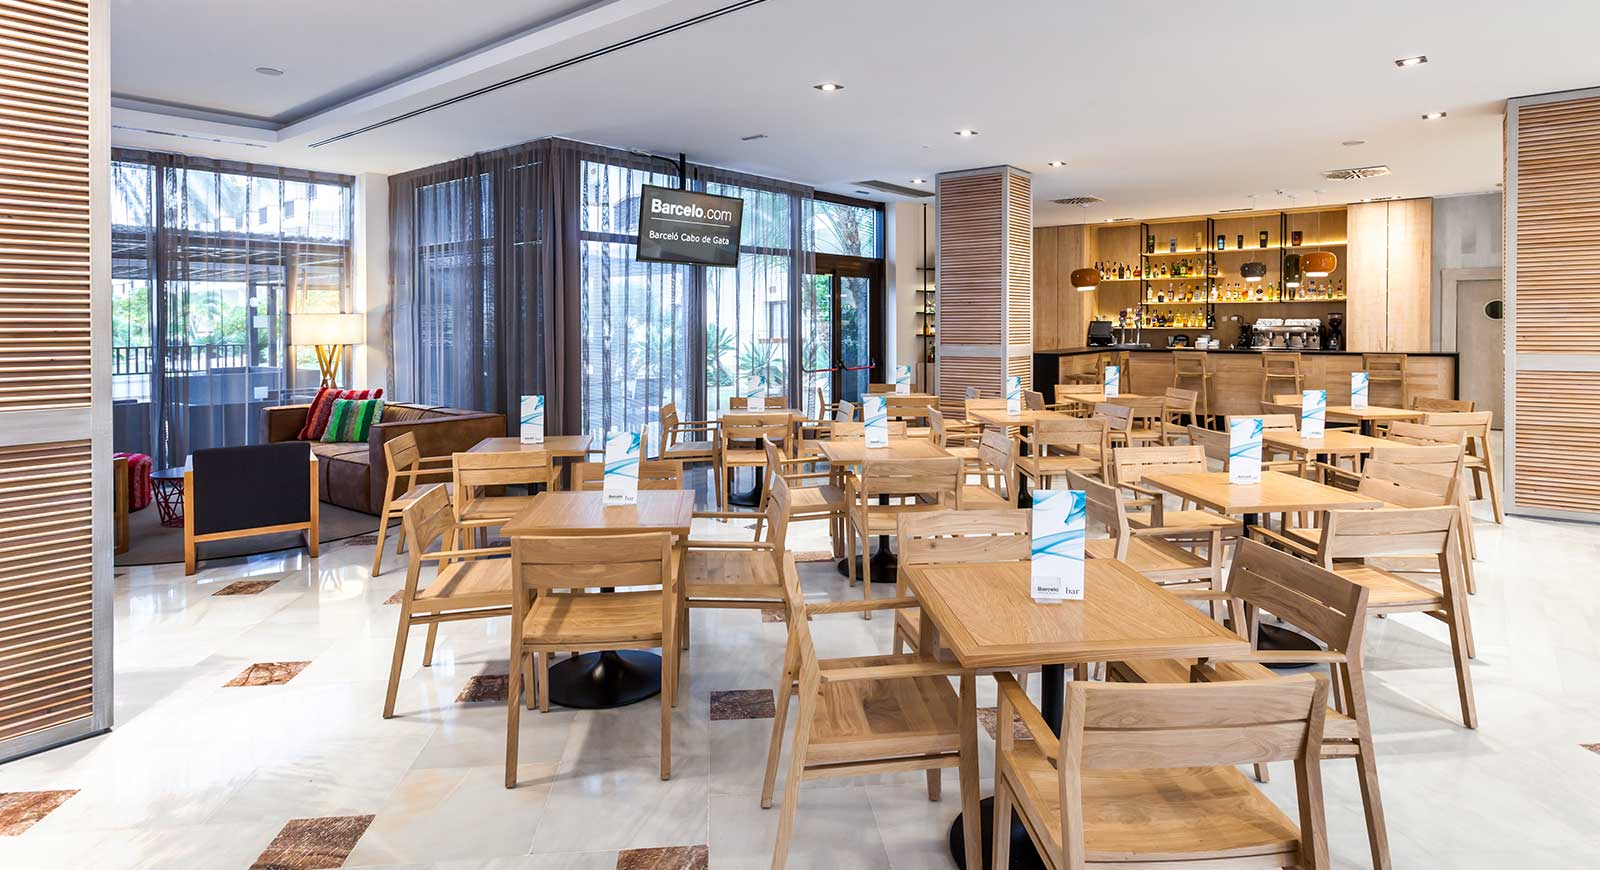 236-restaurant-24-hotel-barcelo-cabo-de-gata_tcm20-8401_w1600_h870_n.jpg